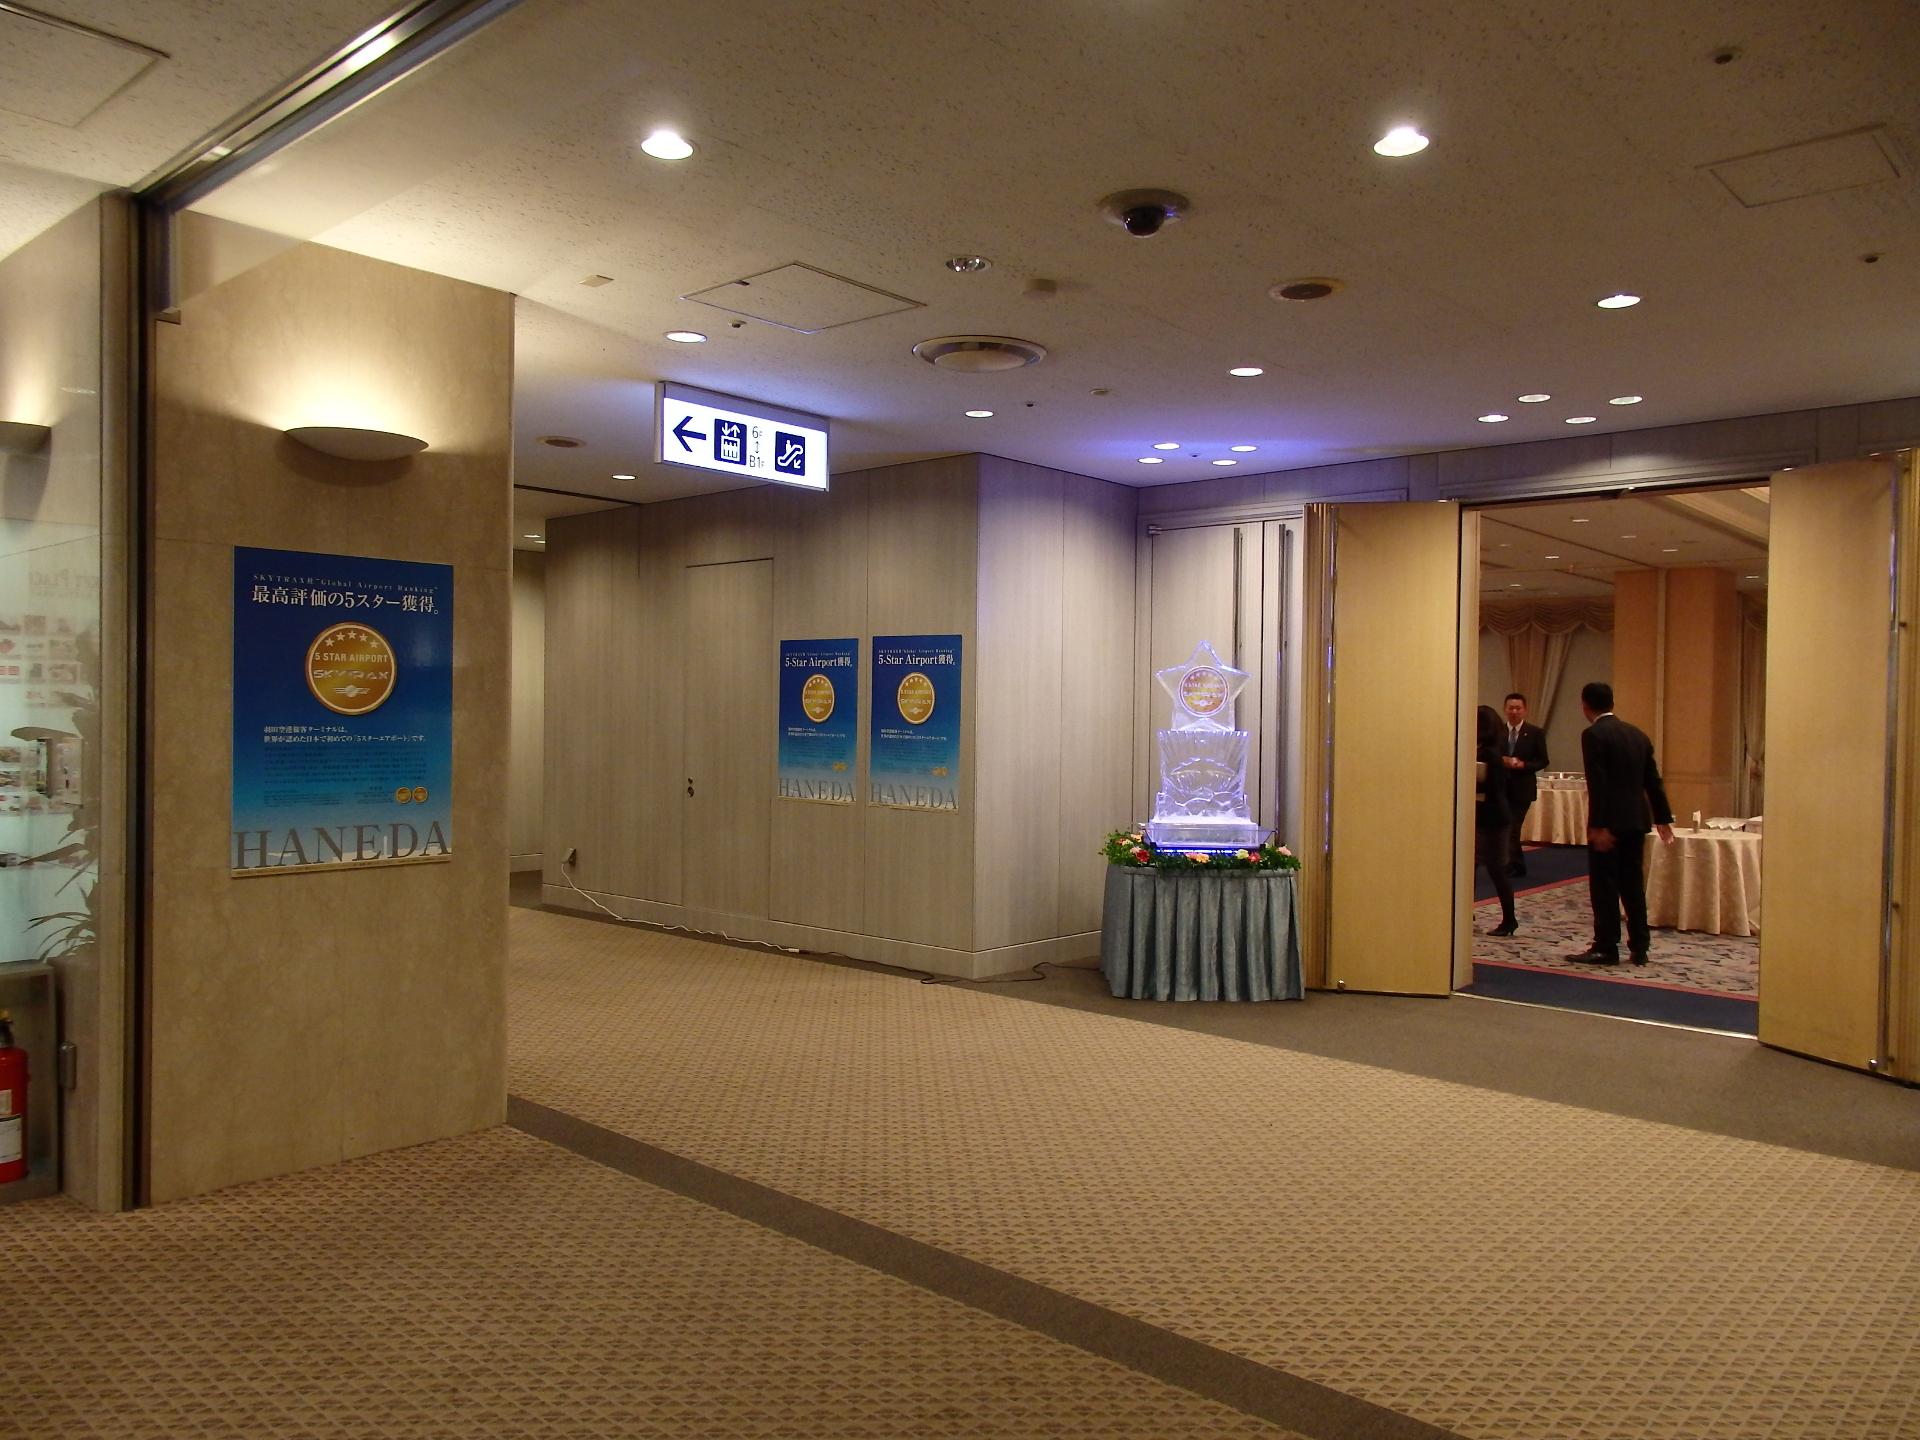 5STAR-AIRPORT受賞祝賀会会場です。